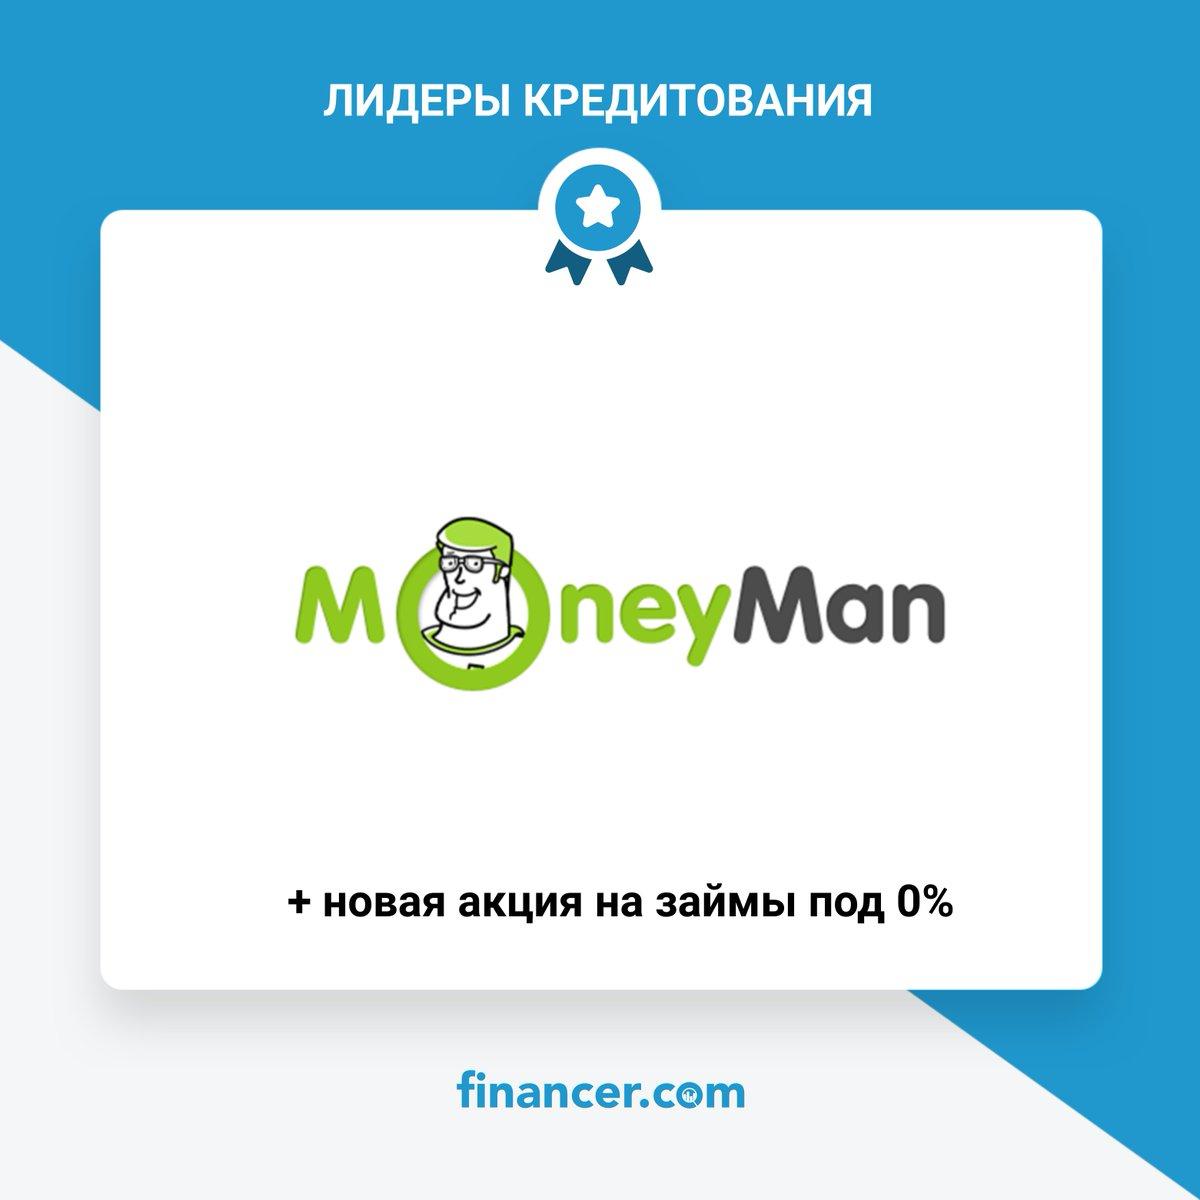 moneyman займ онлайн на карту без отказа